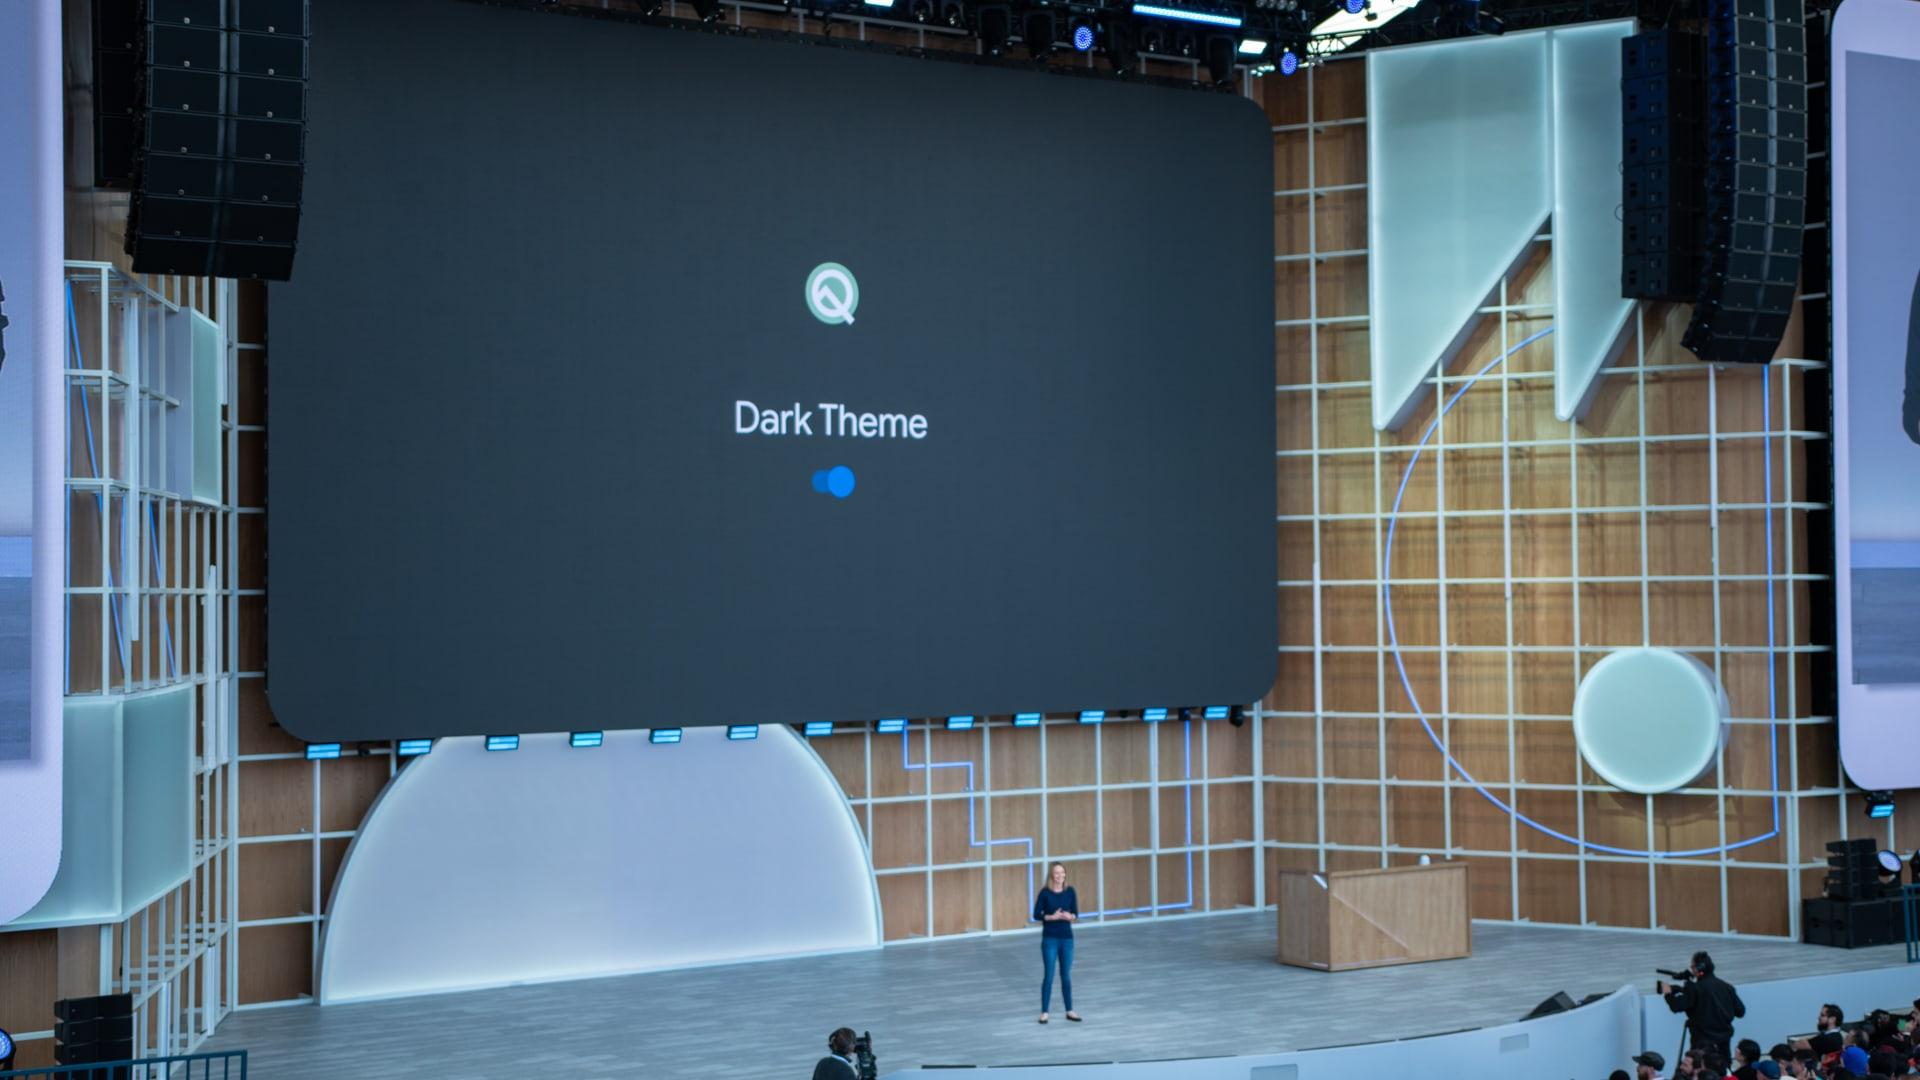 Google I/O 2019 Android Q Dark Theme